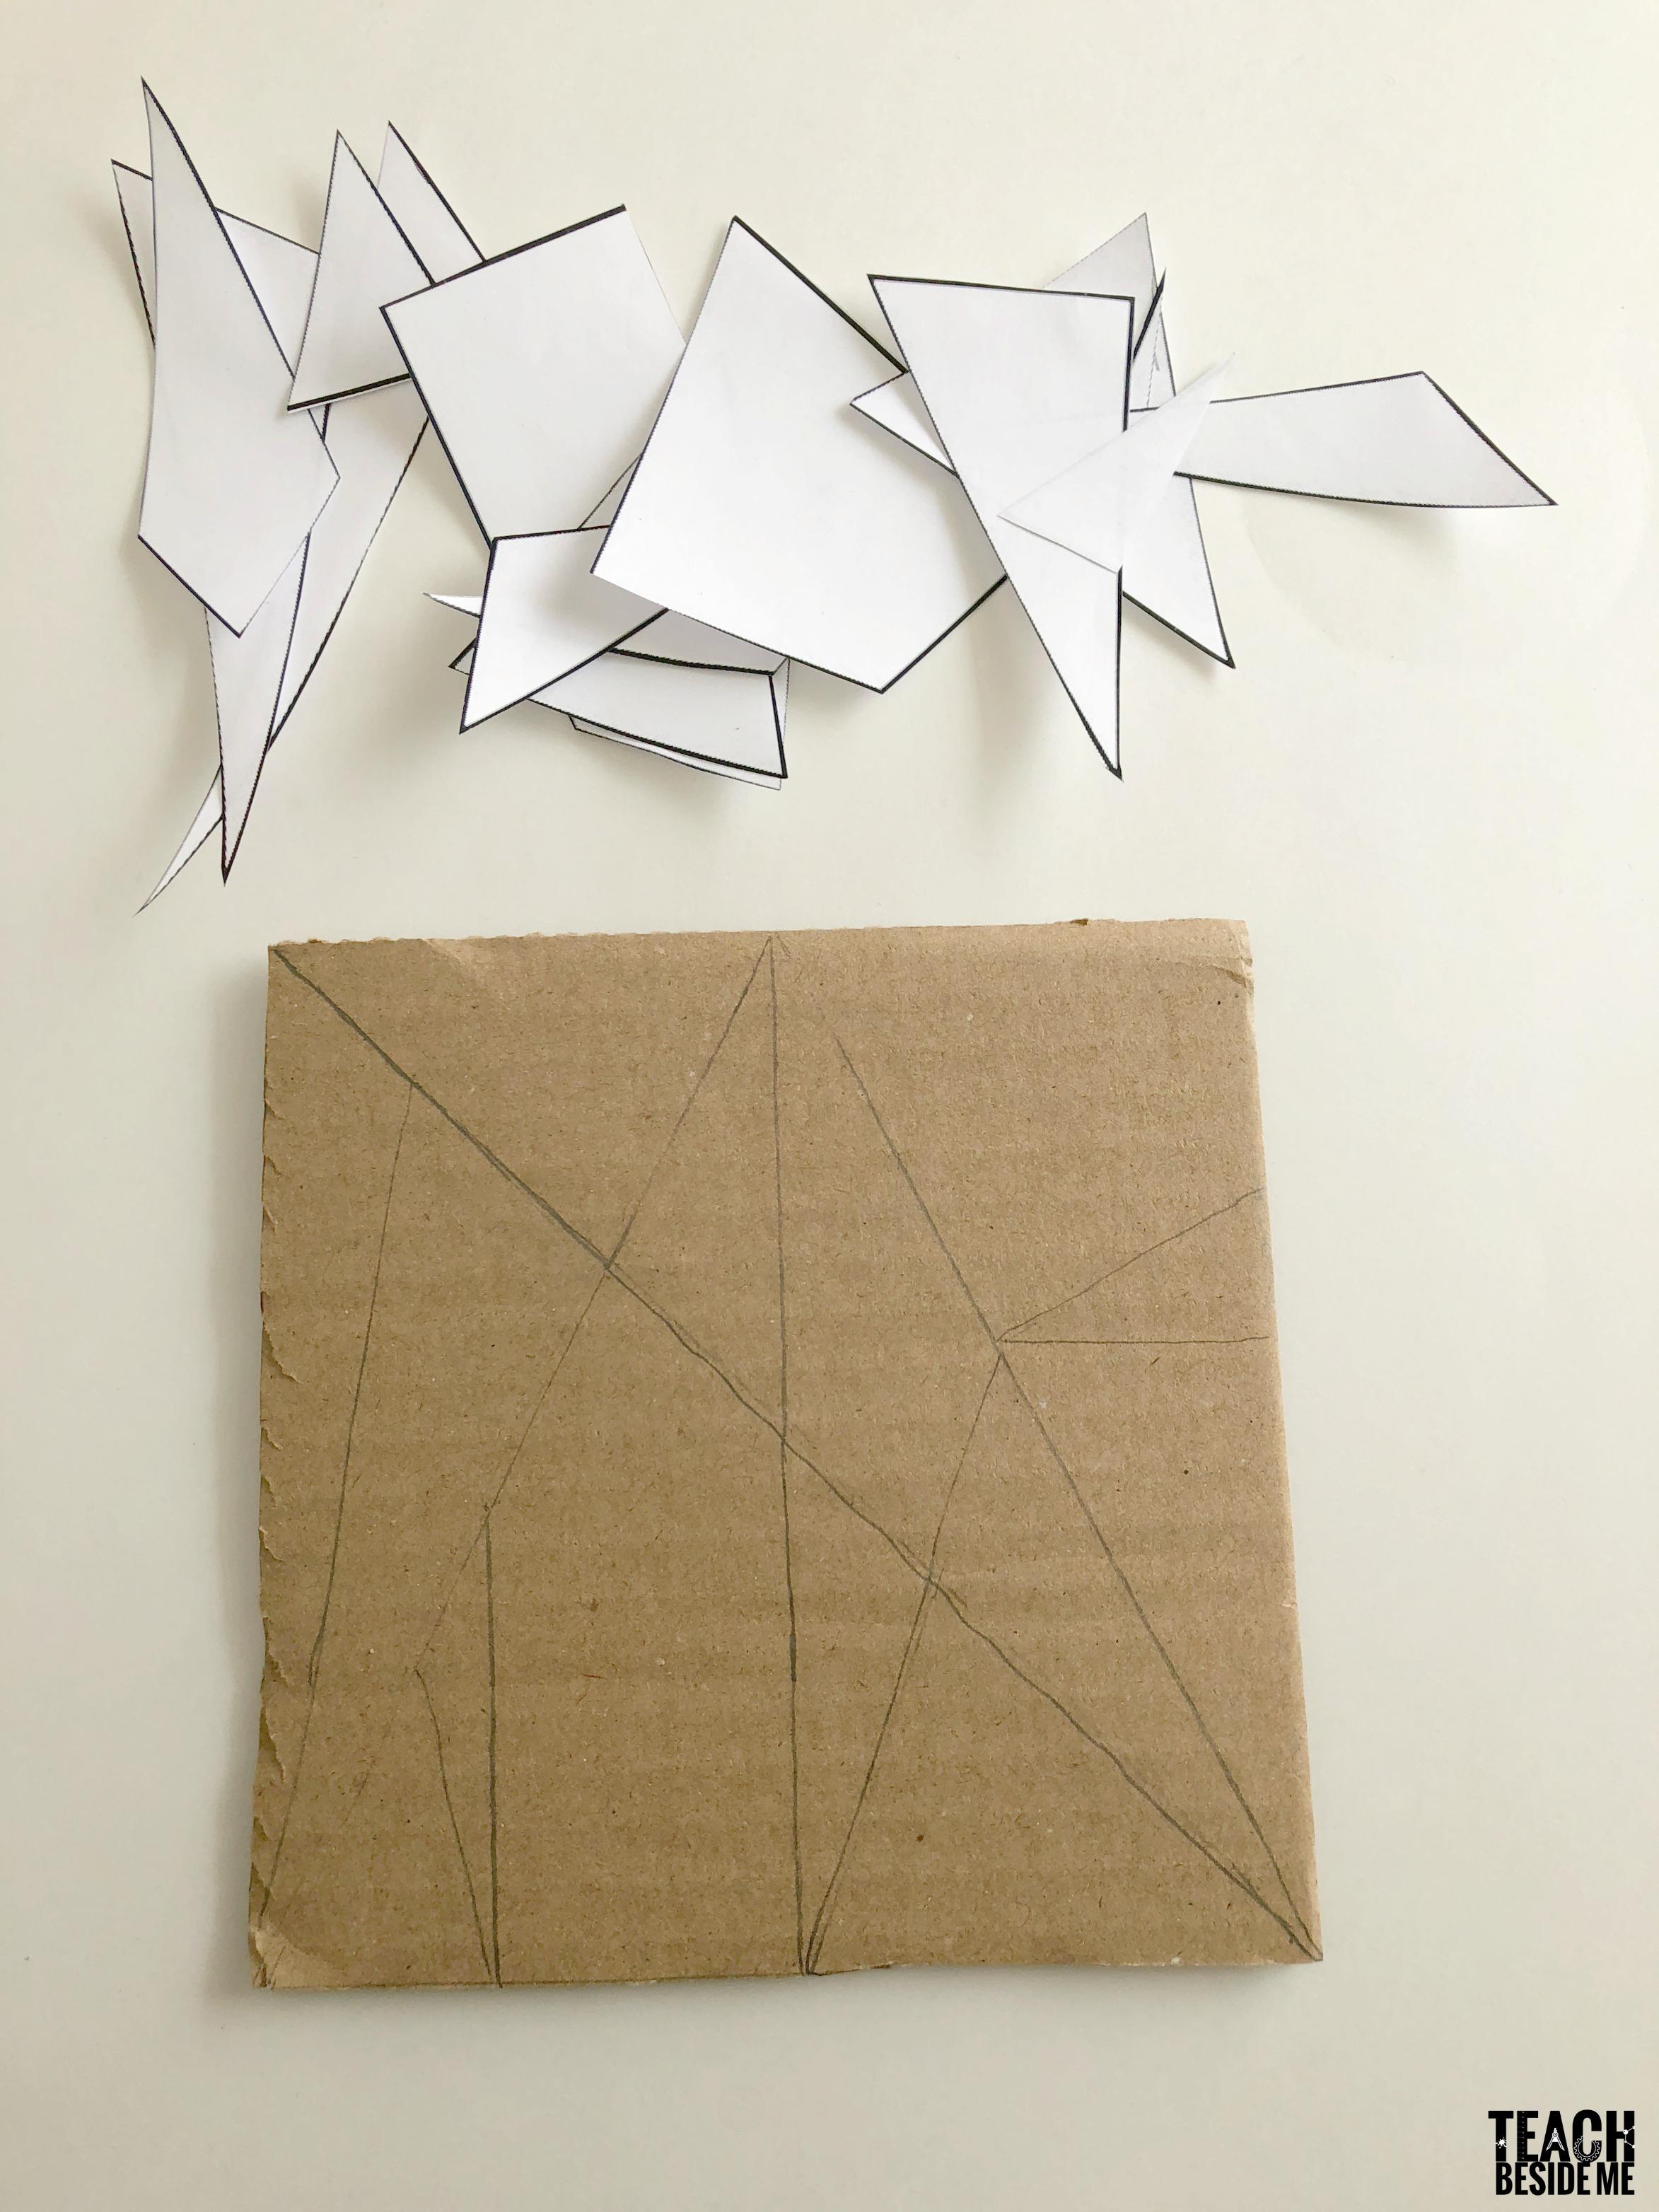 making a math puzzle tangram